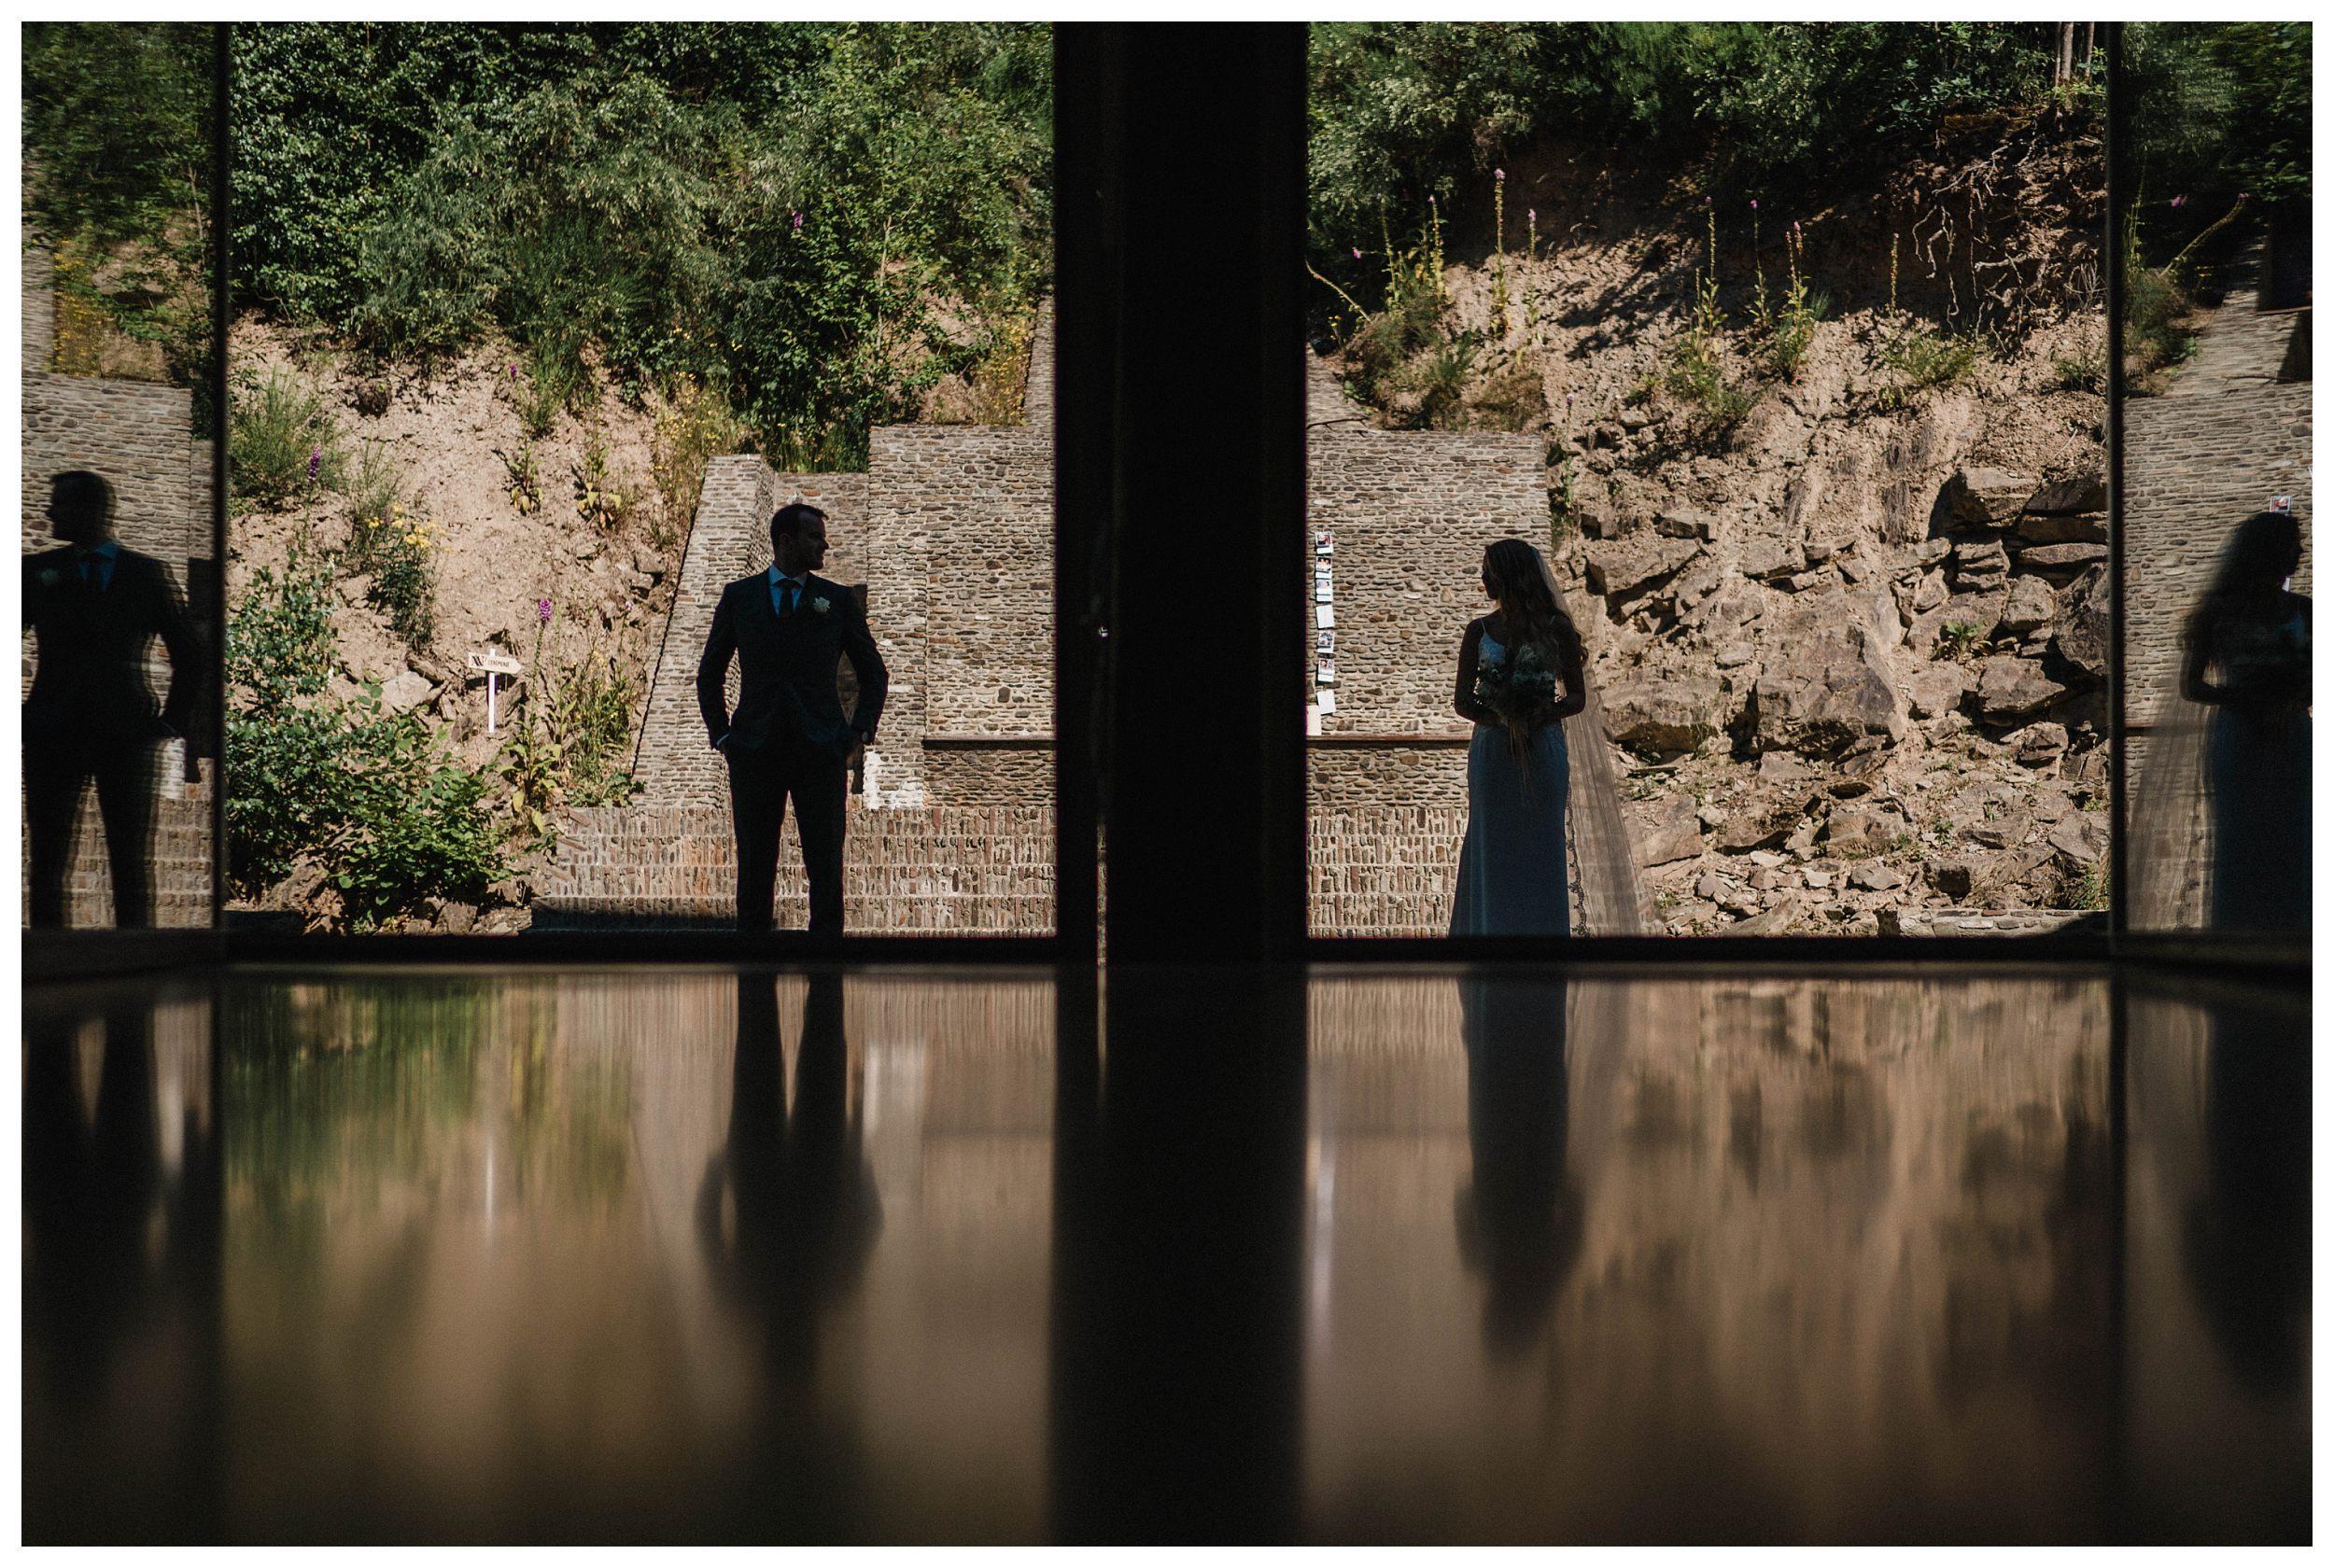 huwelijksfotograaf bruidsfotograaf destinationwedding huwelijksfotografie in ardennen nederland (27).jpg